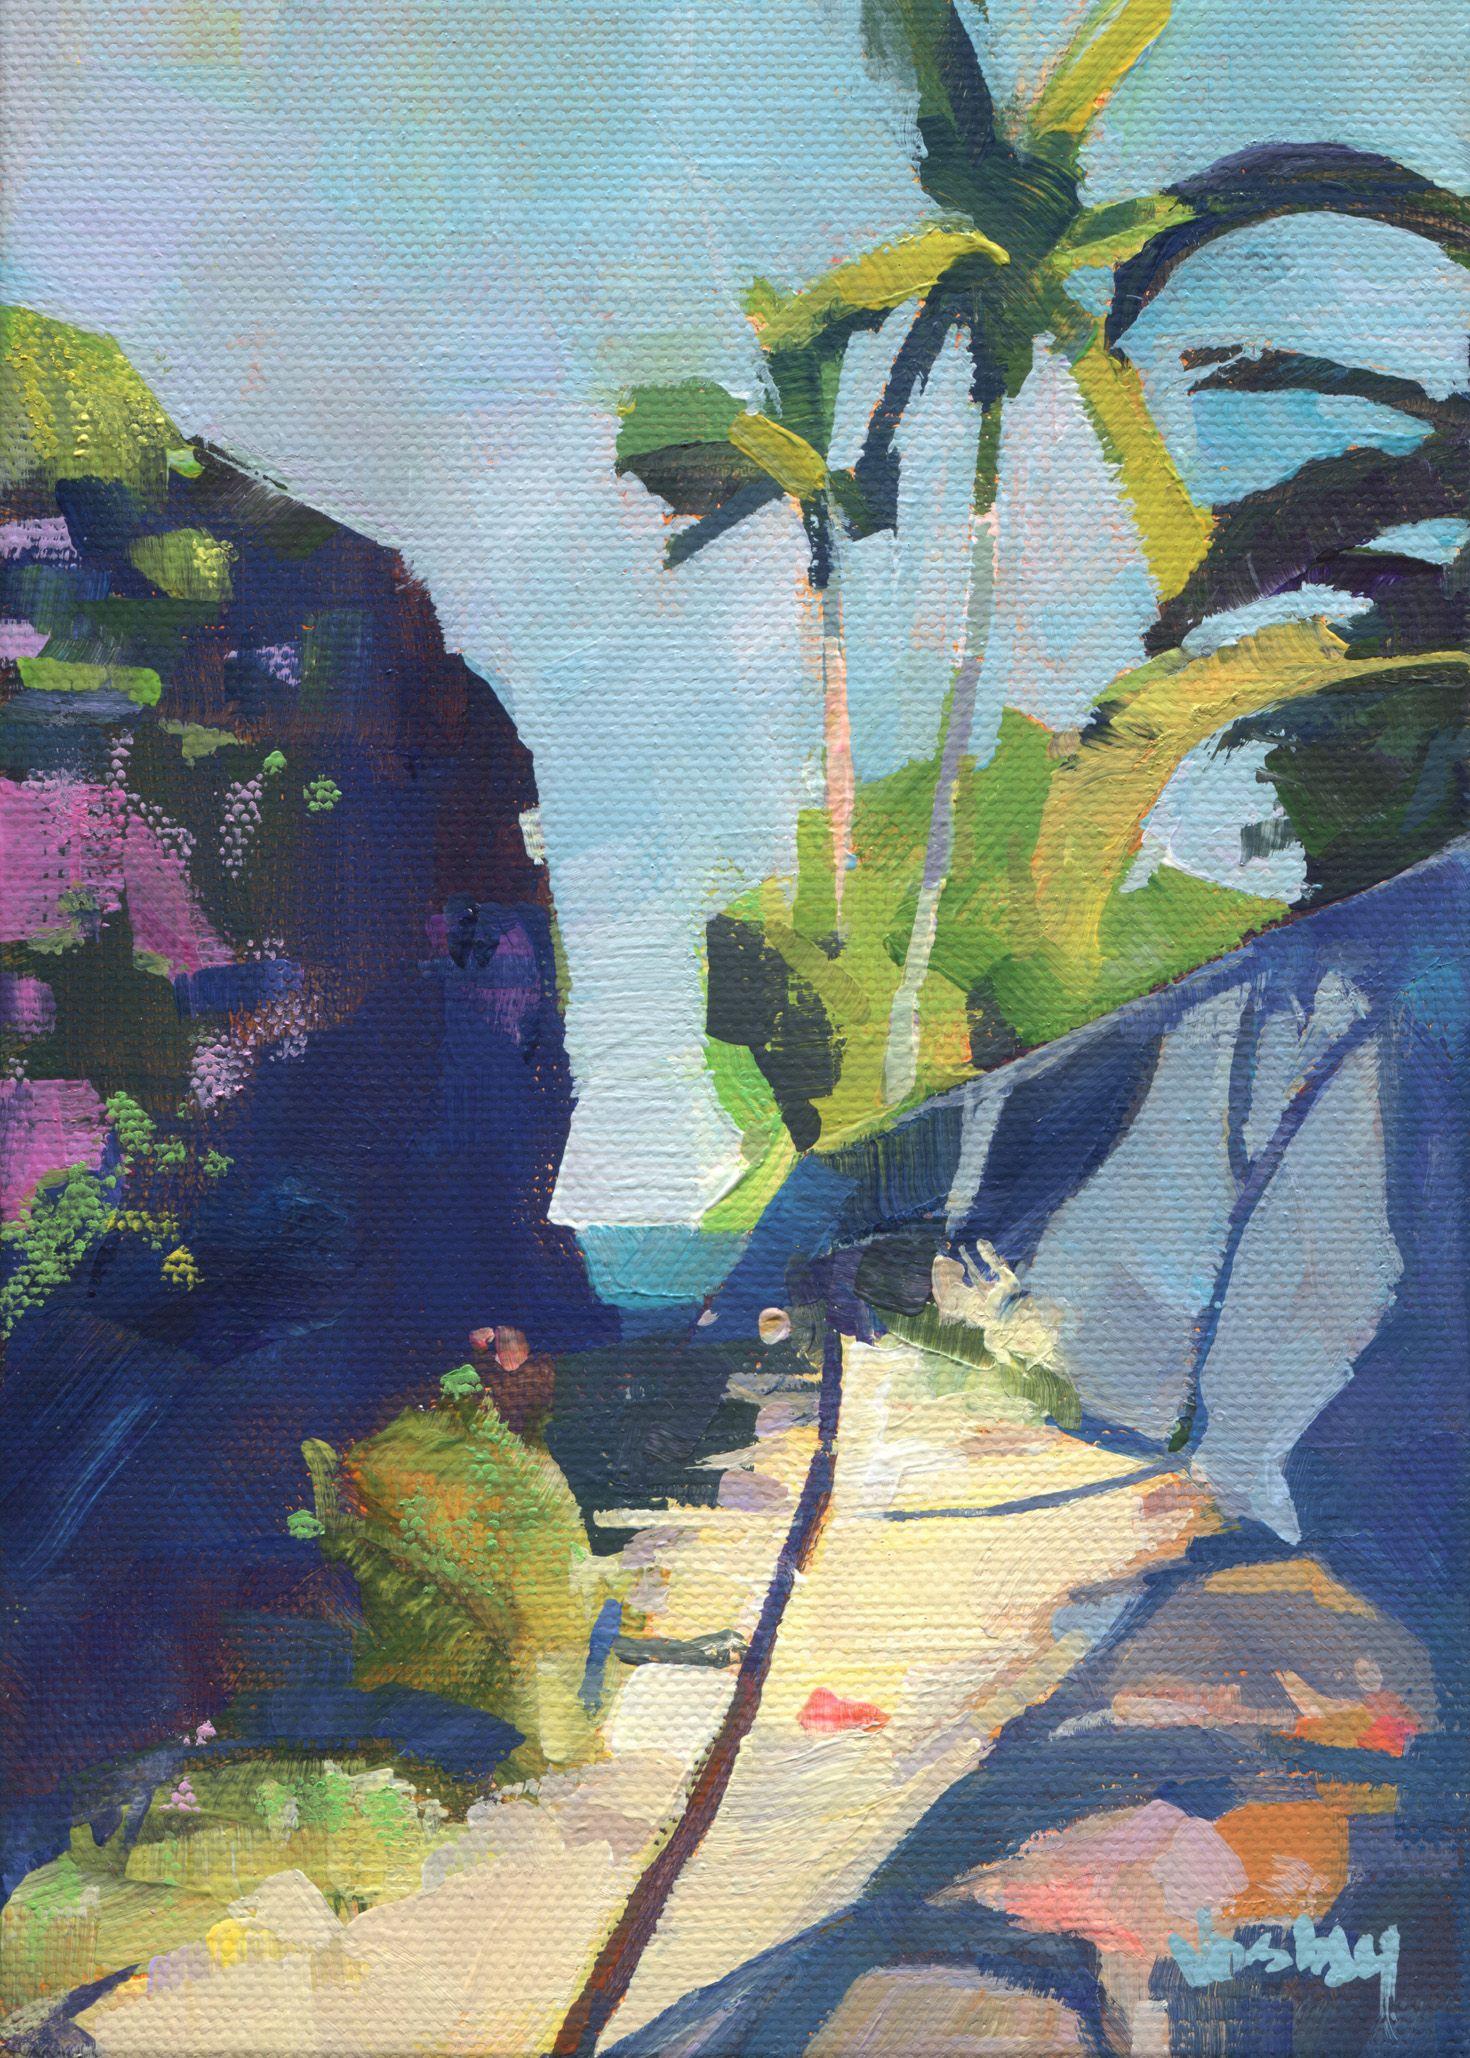 Watercolor artist magazine palm coast fl - Semi Abstract Small Artist Beach Landscape Palm Tress Art Painting Tropical Maui Island Hawaii By Stacyvosbergfineart On Etsy